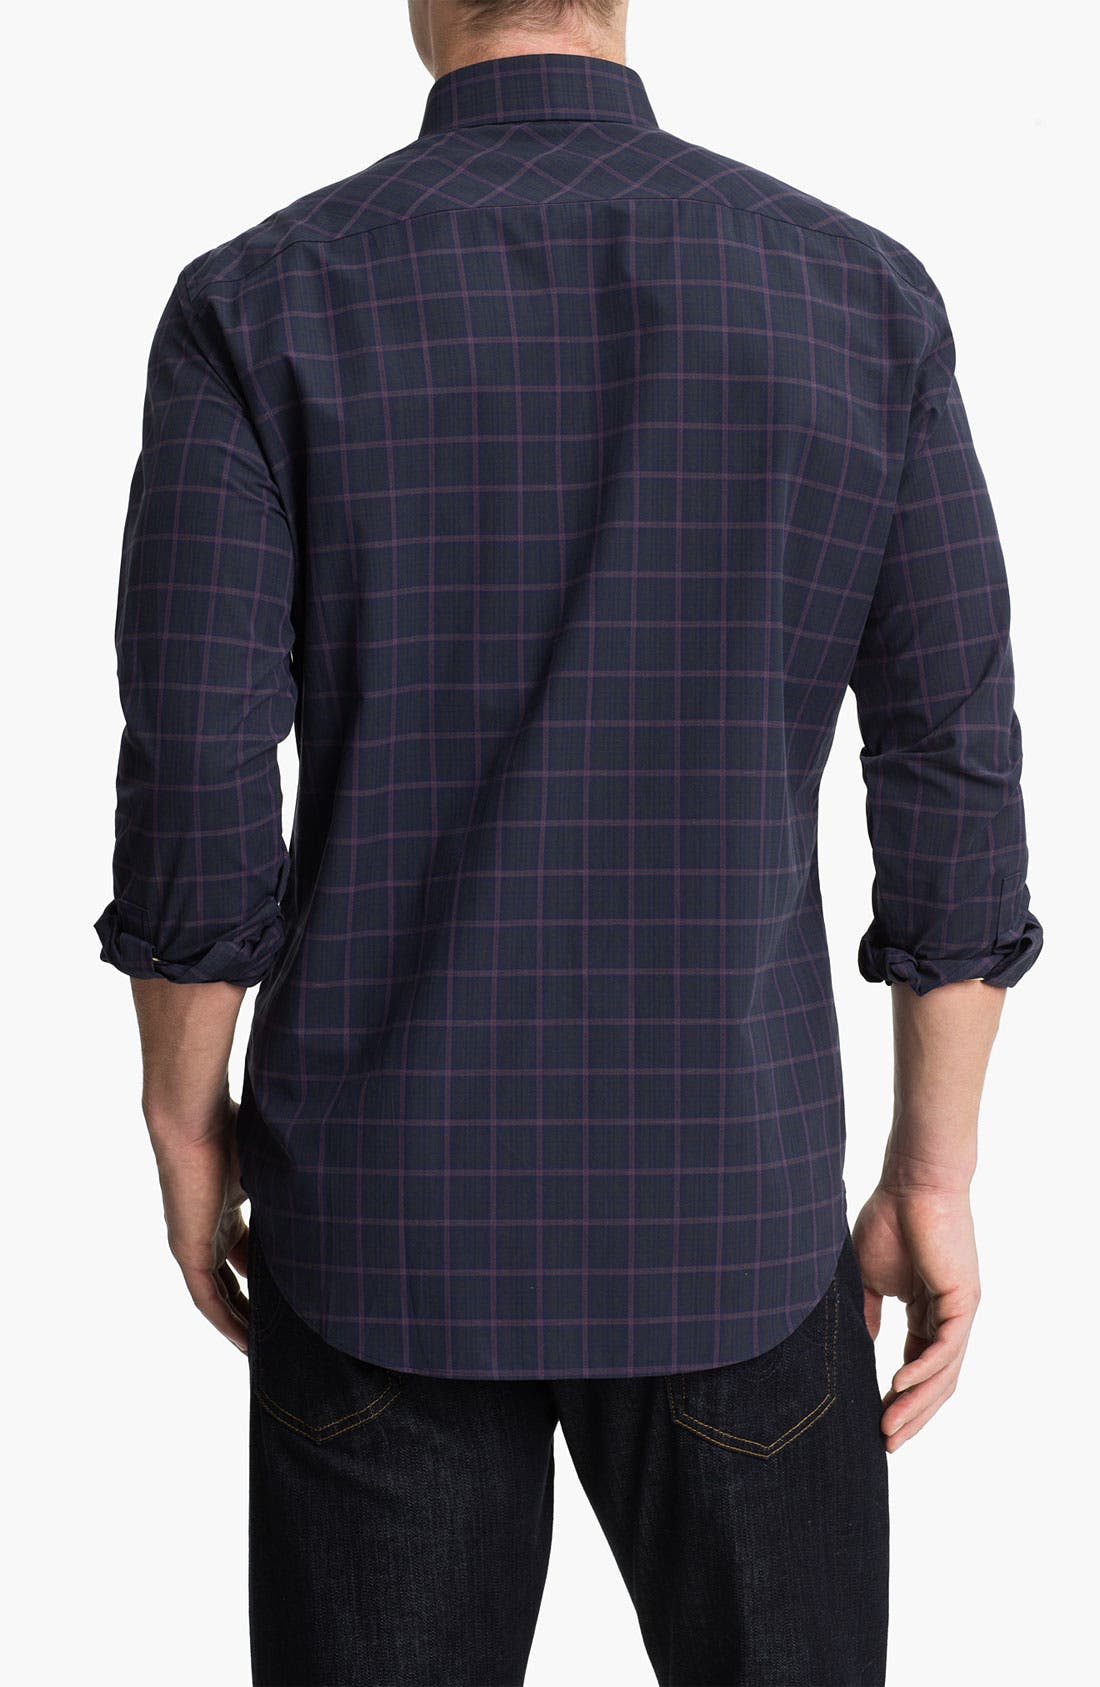 Alternate Image 3  - Zachary Prell 'Handley' Sport Shirt